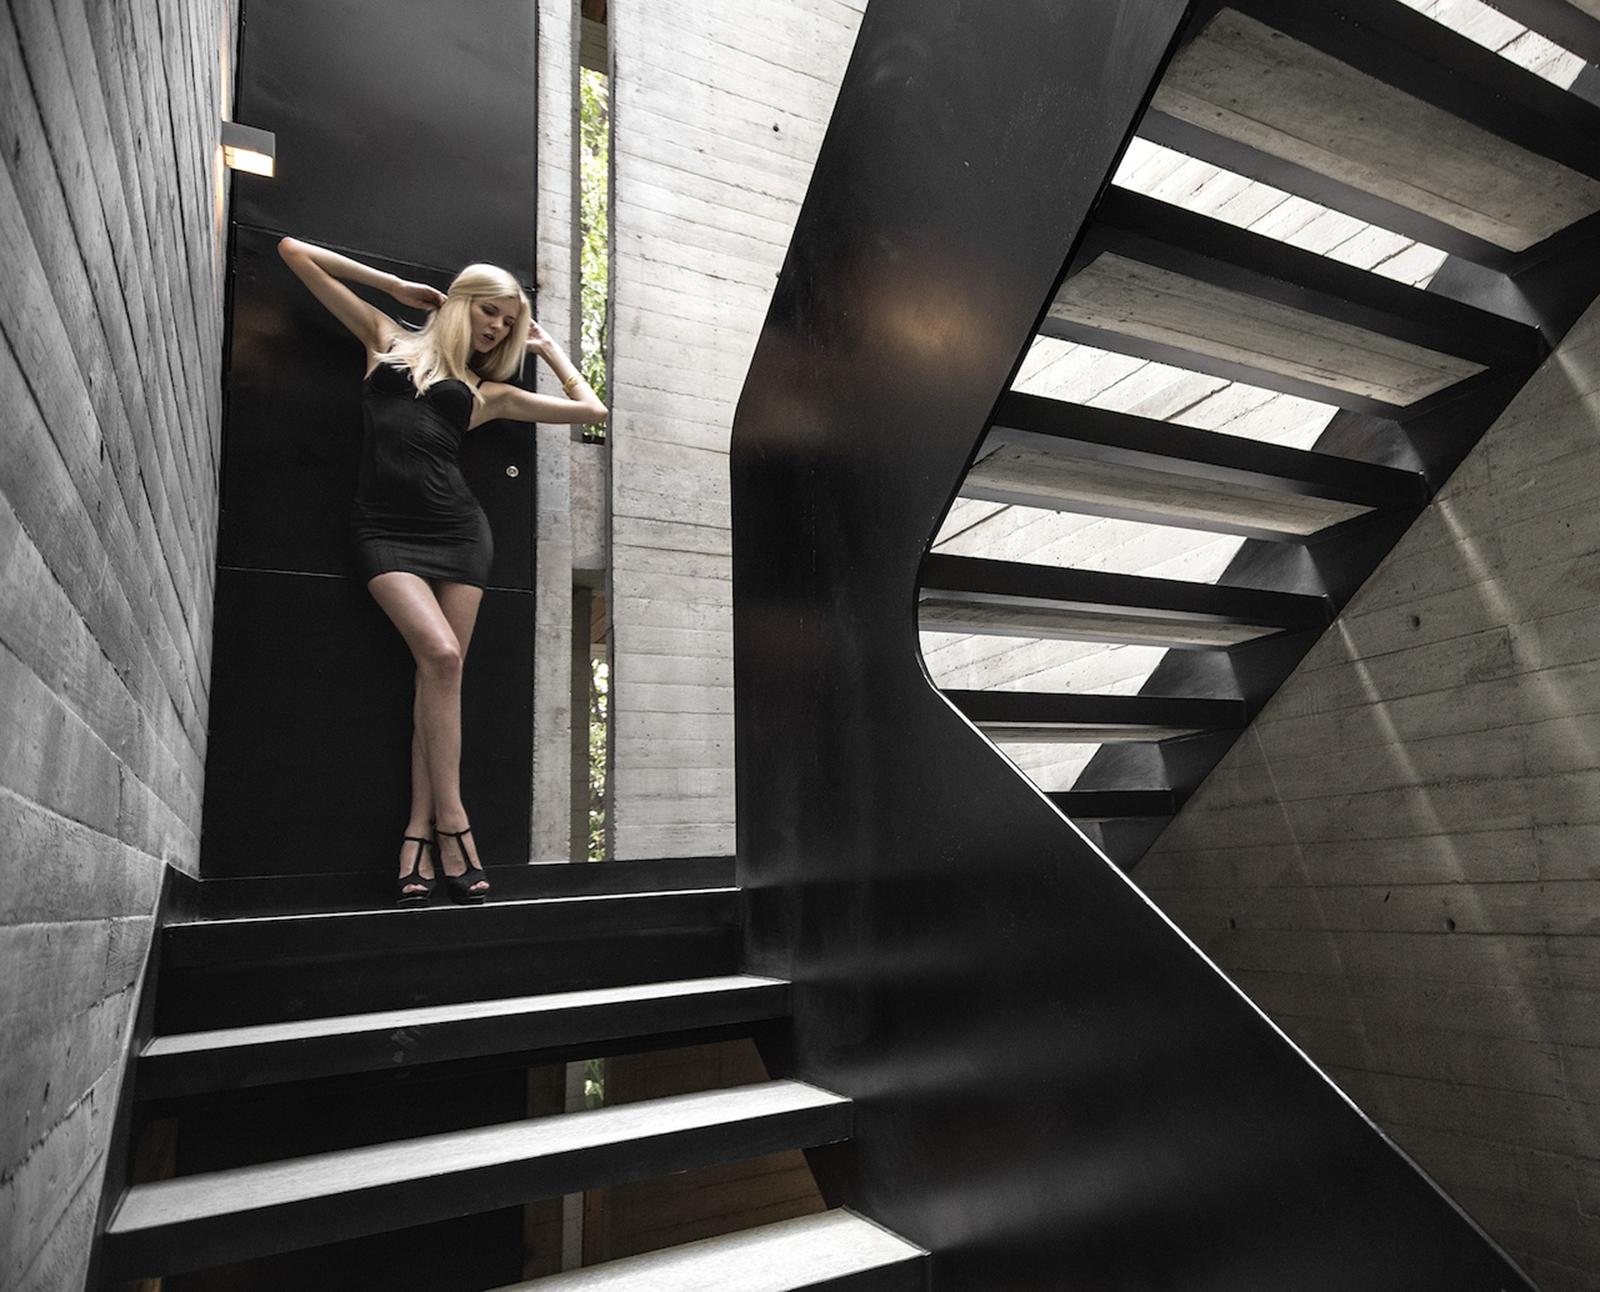 escalera (Foto por Santiago Perez Grovas).jpg